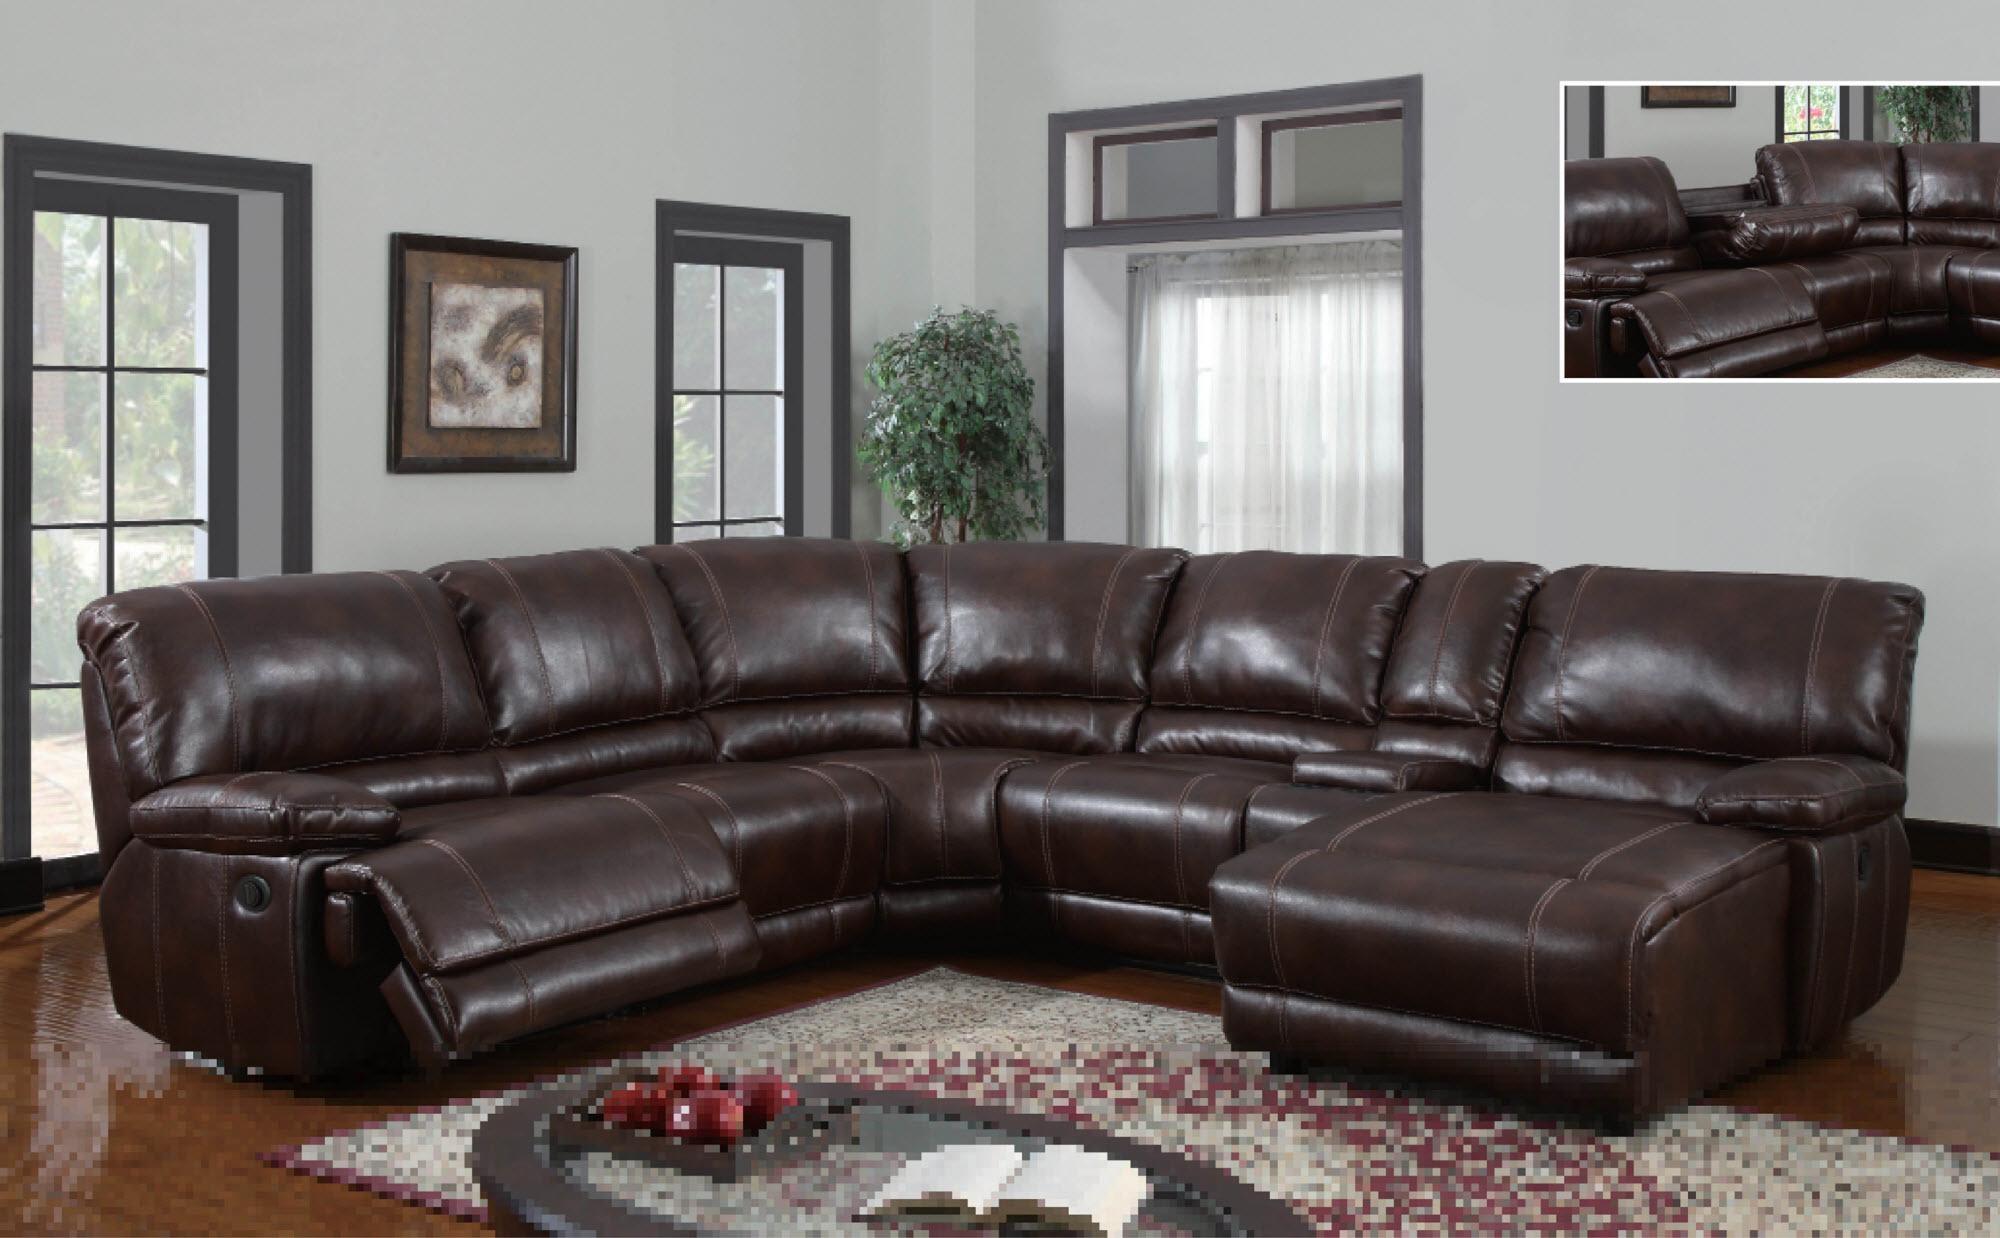 Berkline Sectional Sofa – Bible Saitama With Berkline Sectional Sofa (View 13 of 15)